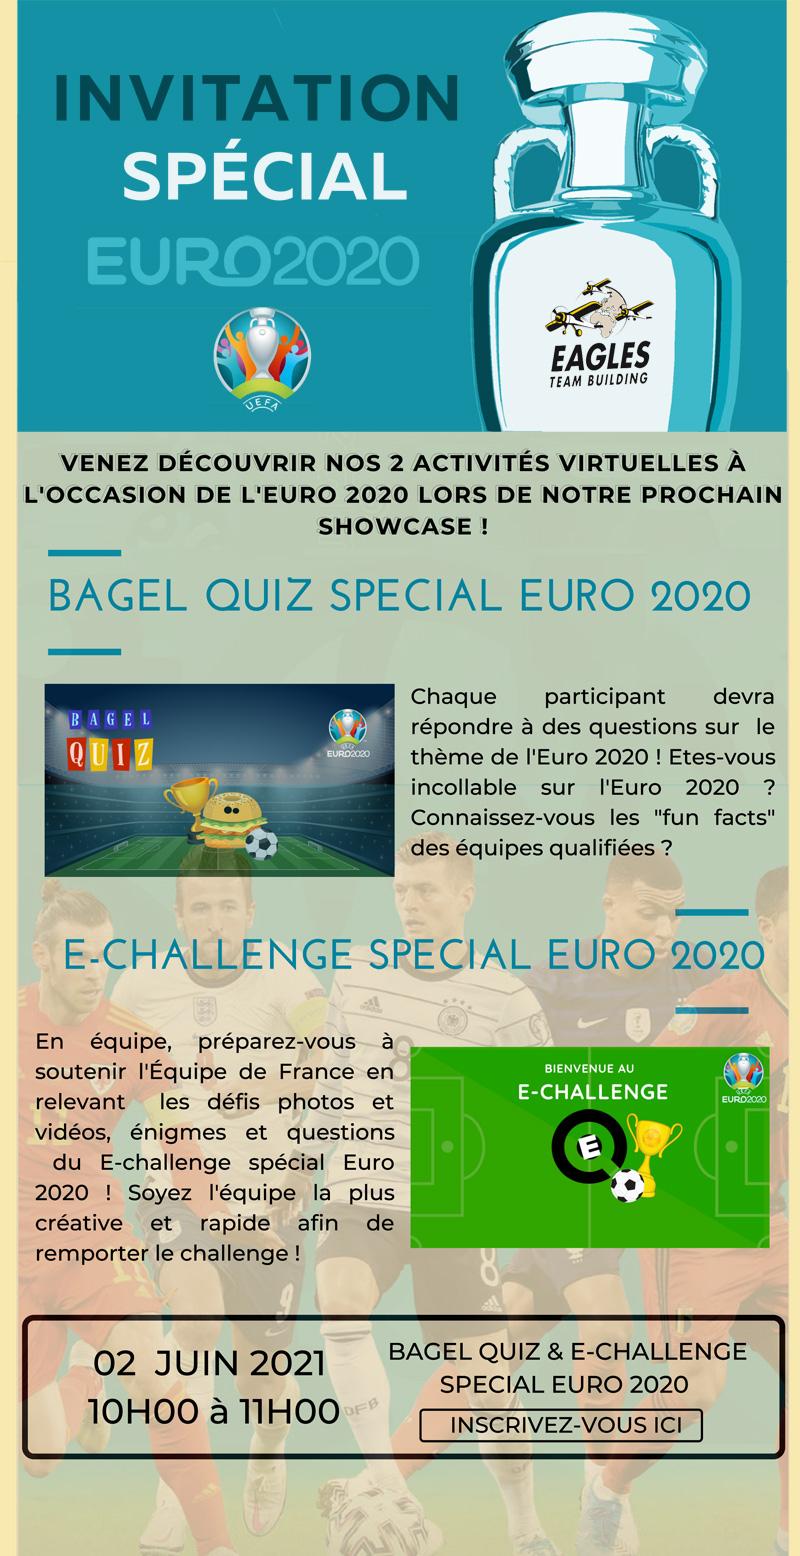 Invitation - Showcase spécial Euro 2020